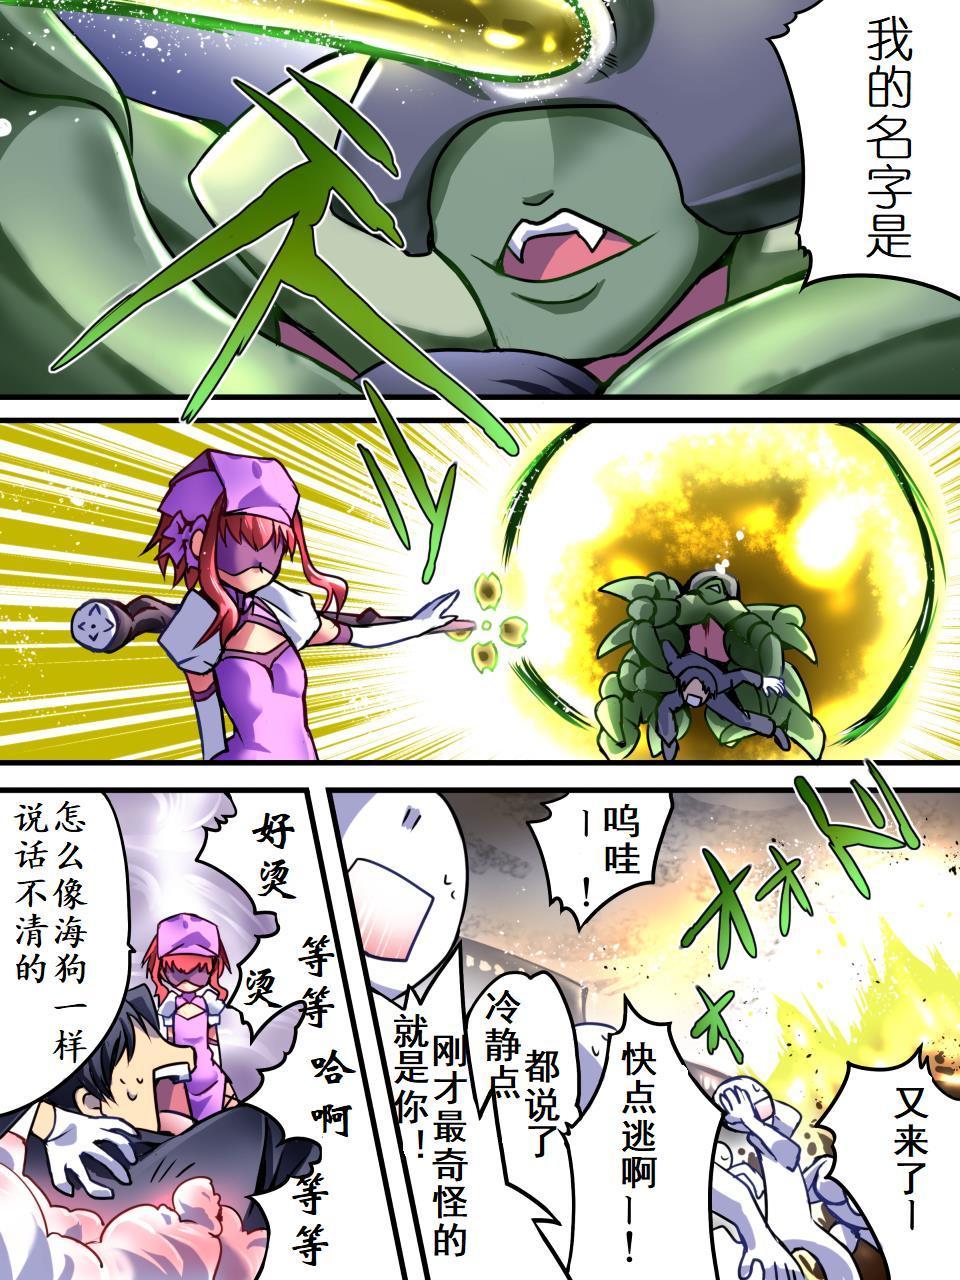 [Atelier Hachifukuan] Superheroine Yuukai Ryoujoku III - Superheroine in Distress [Chrome Rose Bell]   凌辱诱拐3 [Chinese] [有条色狼汉化] 10